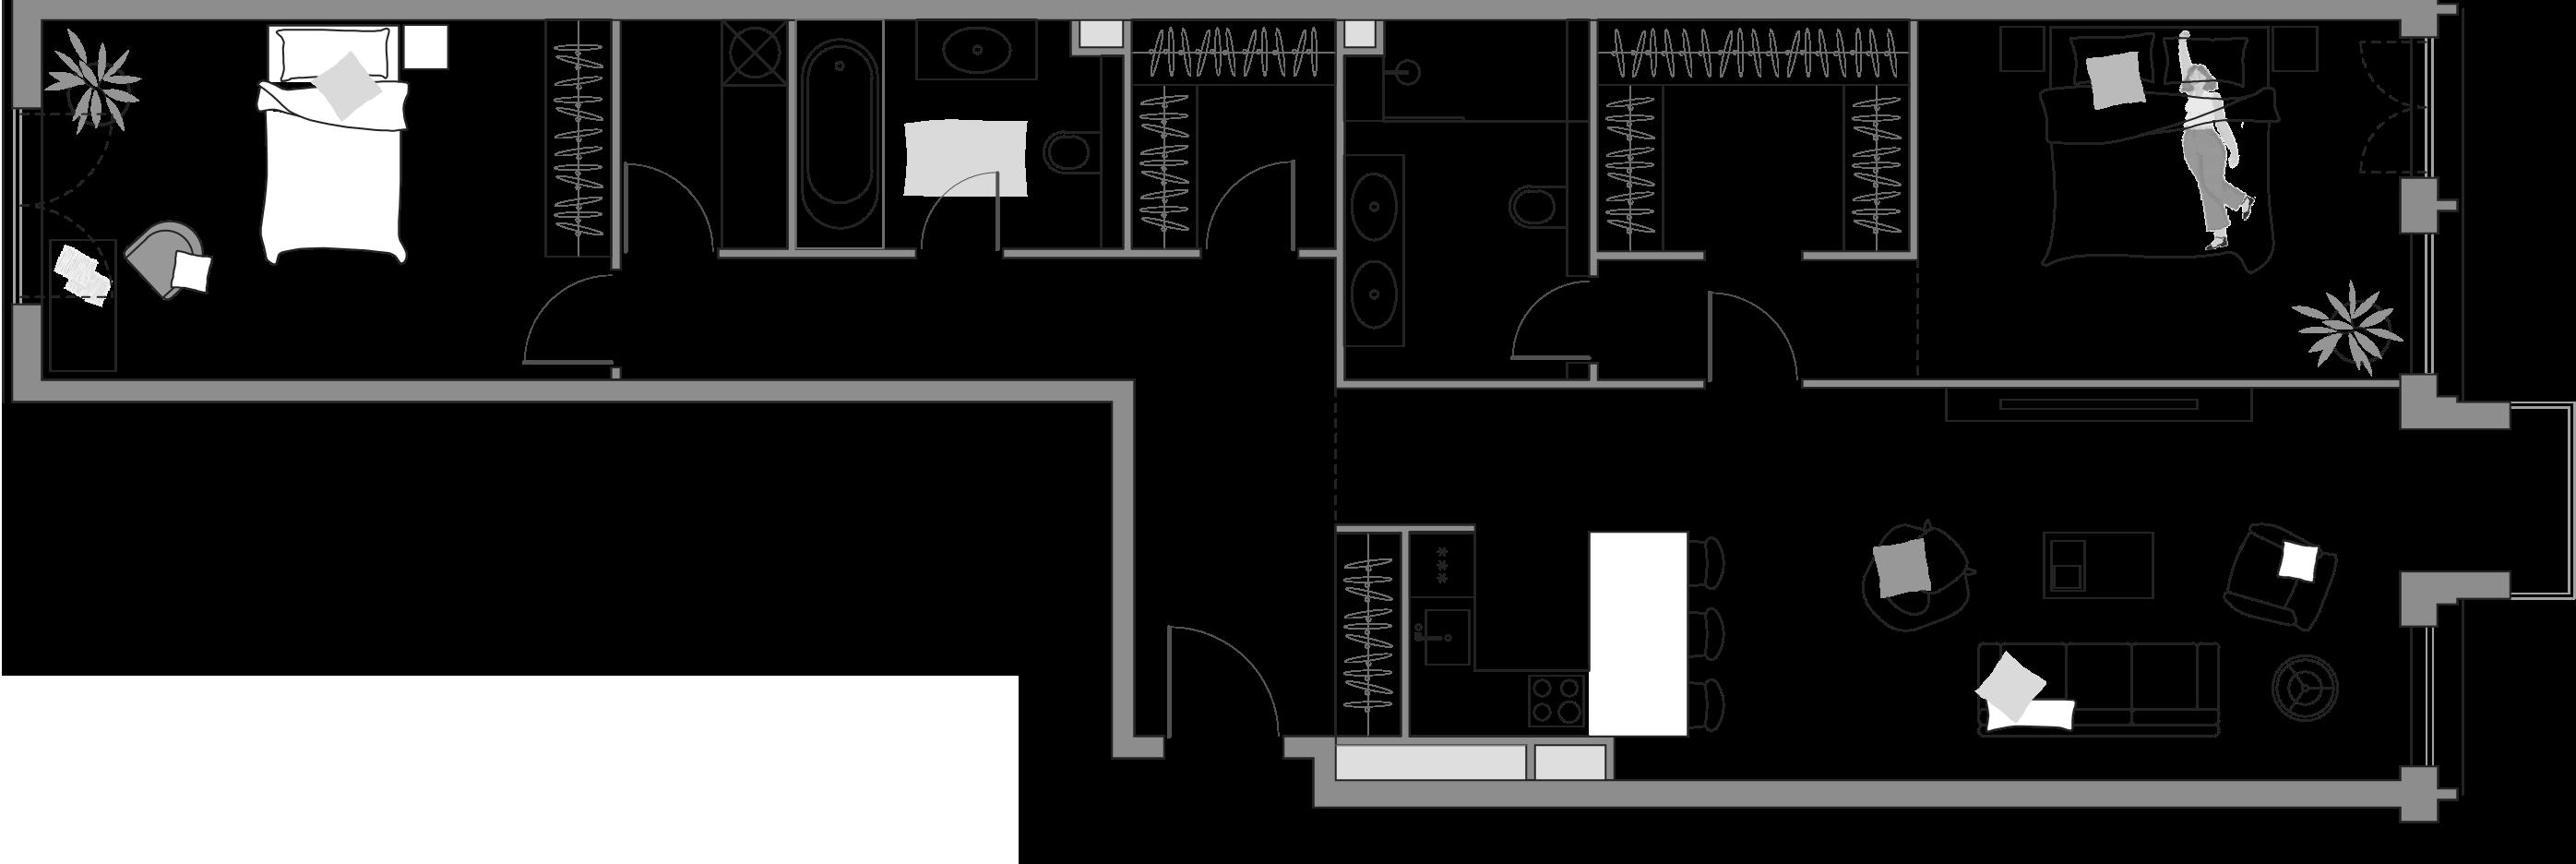 3Е-к.кв, 109.93 м²